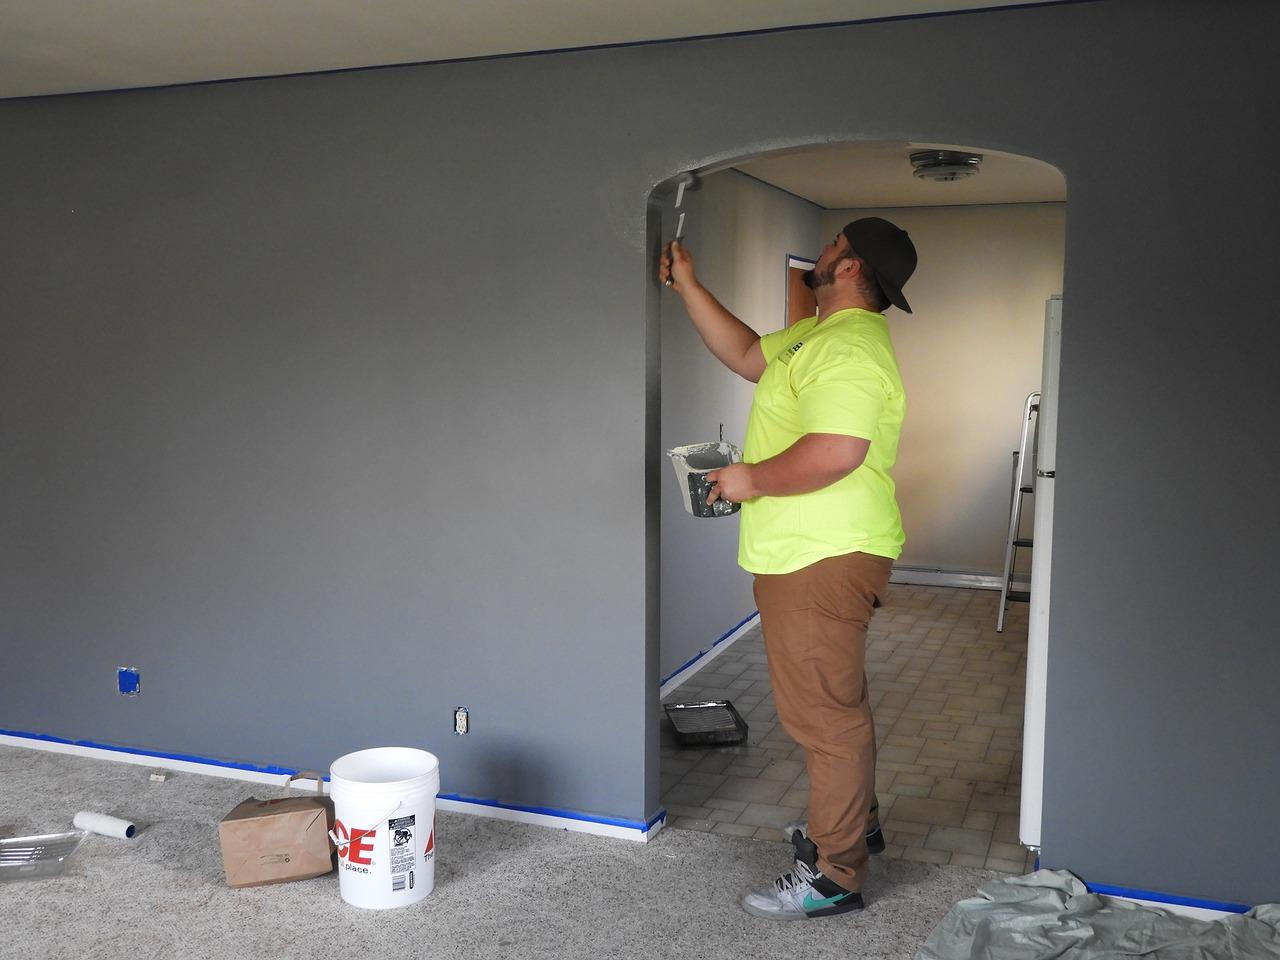 Malowanie sufitu – prosto i profesjonalnie!